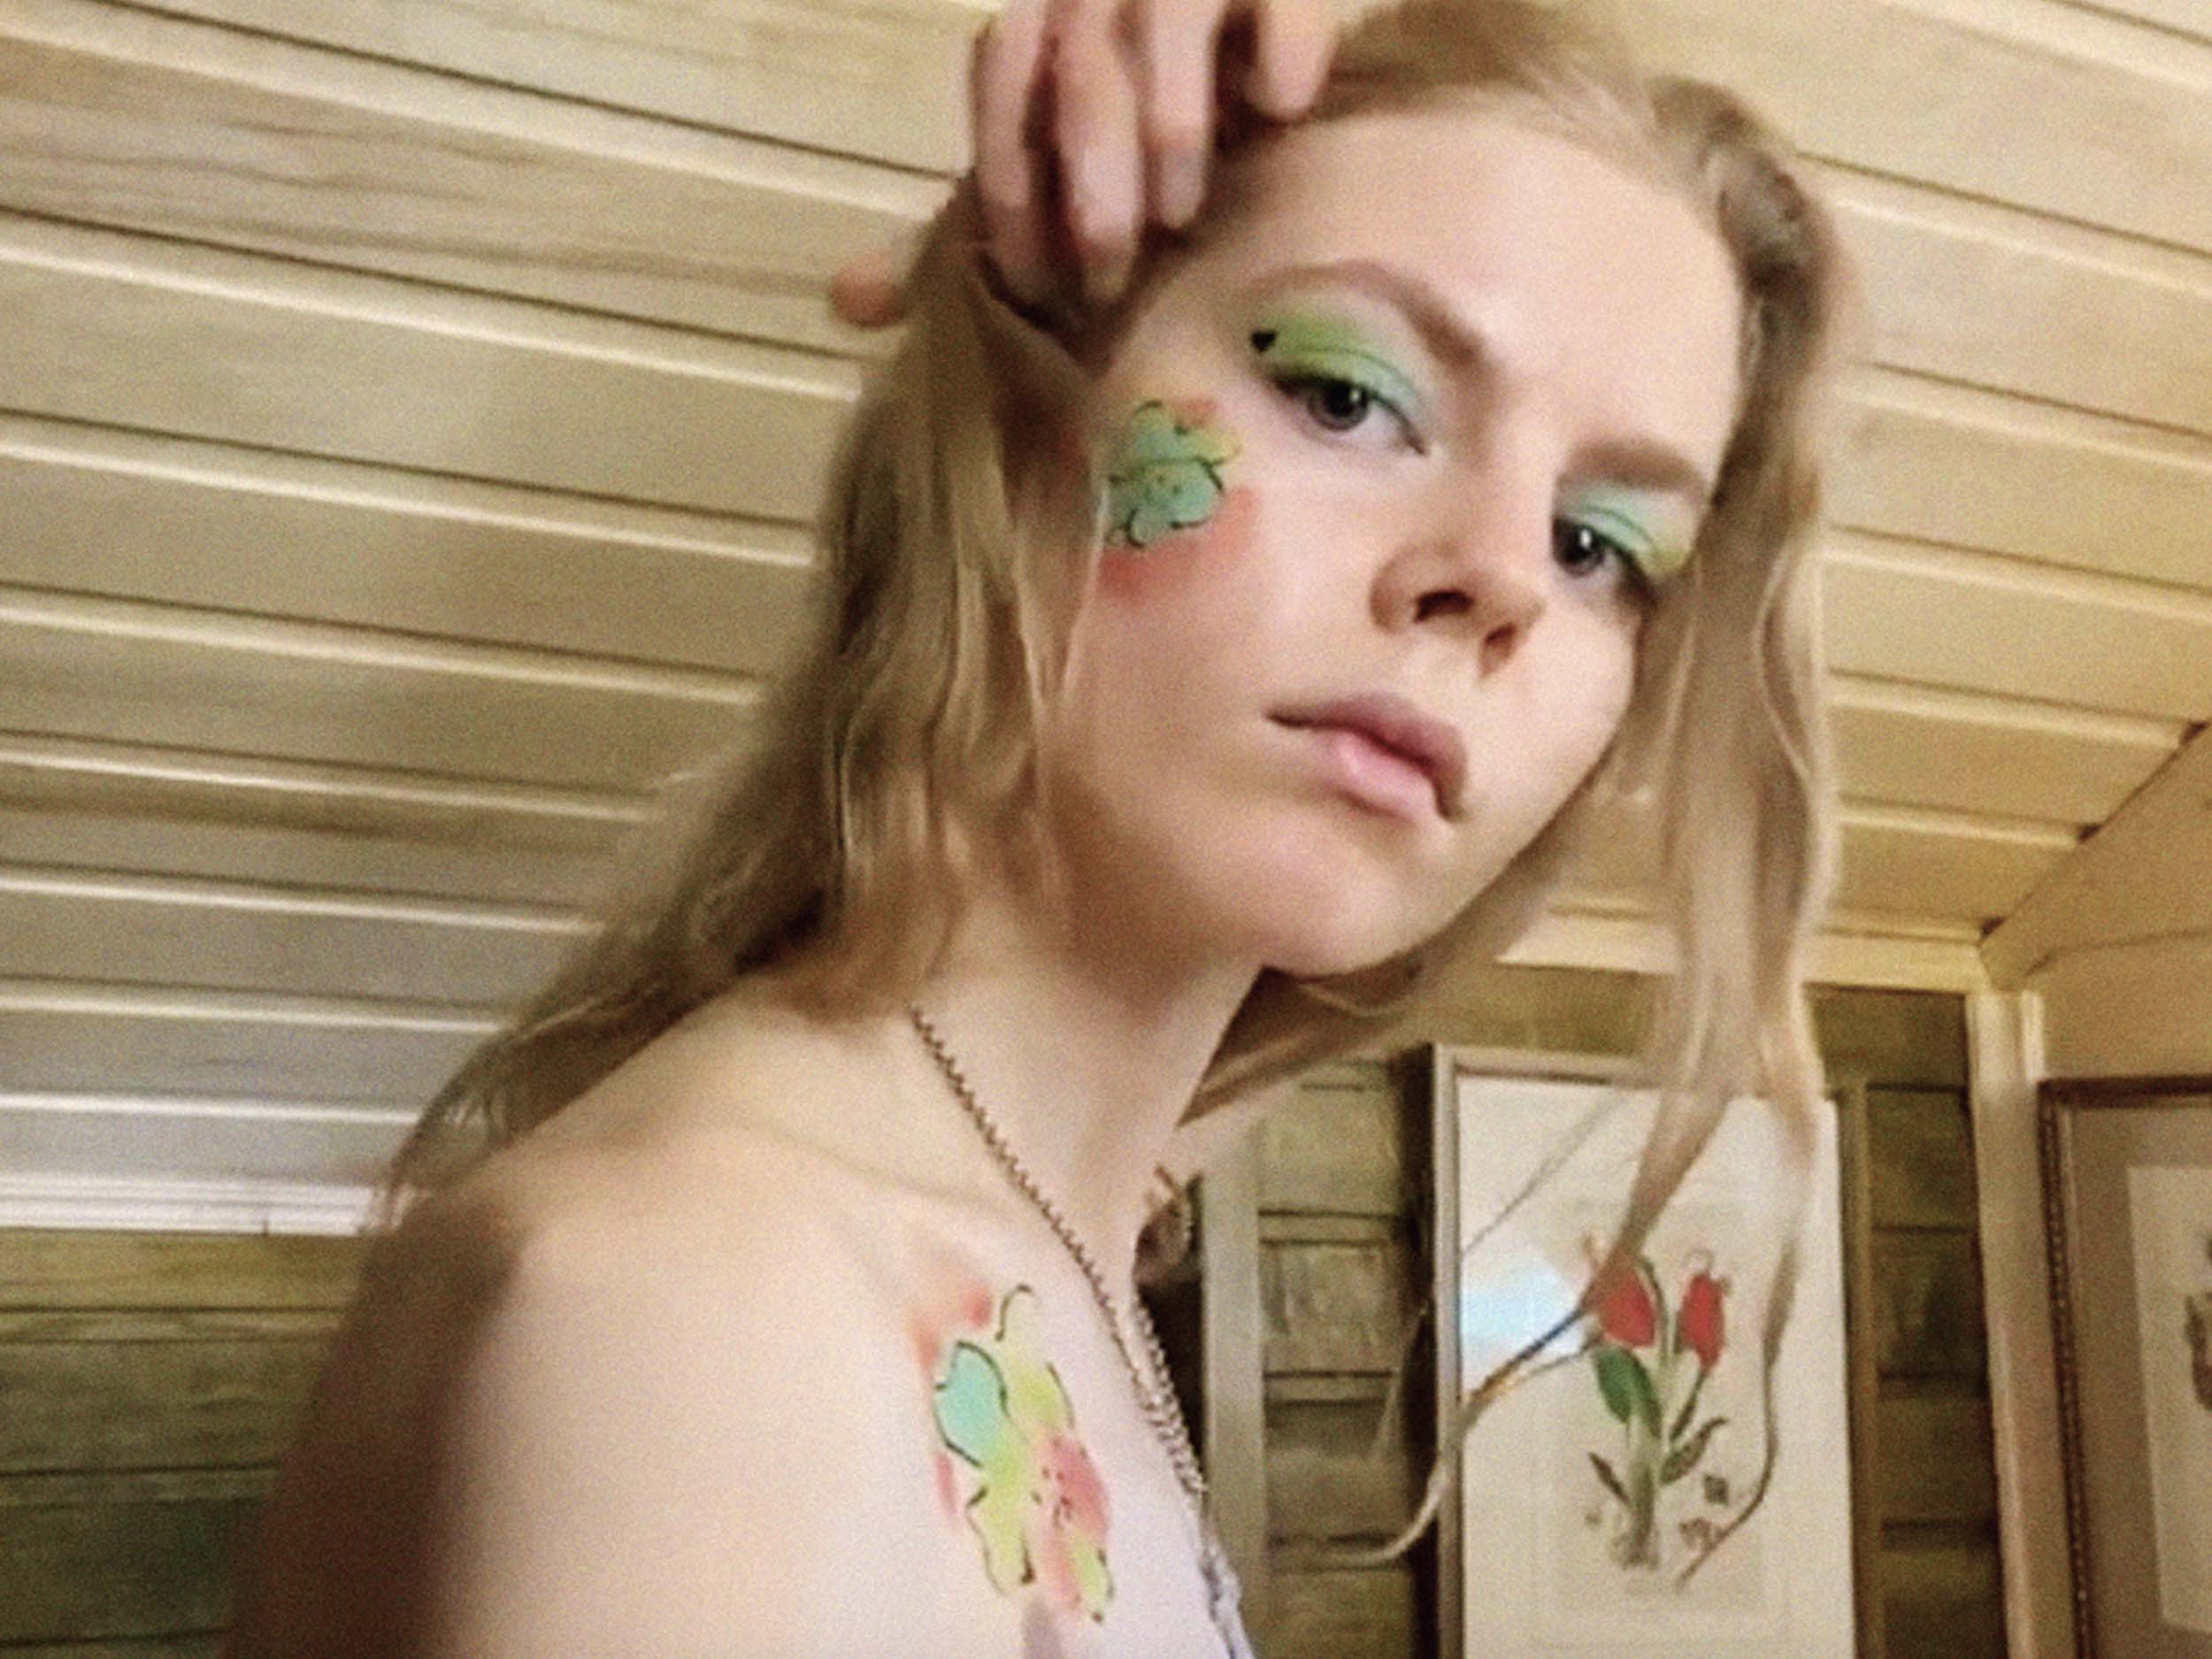 Jolie Alien transforms into a Veruschka-inspired, quarantined wood nymph